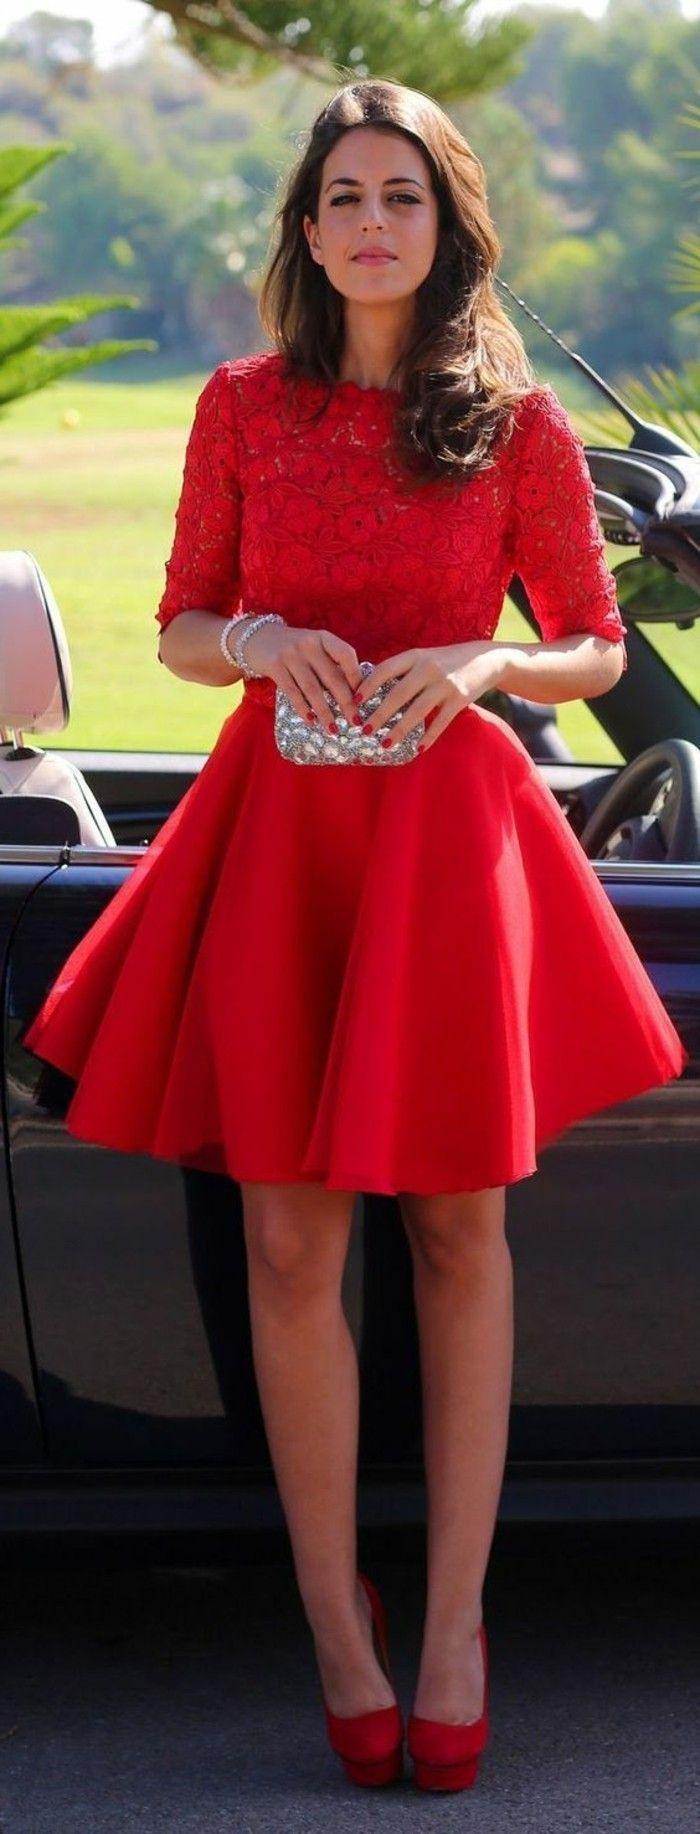 13 Genial Rotes Kleid Kurz Stylish17 Cool Rotes Kleid Kurz Boutique